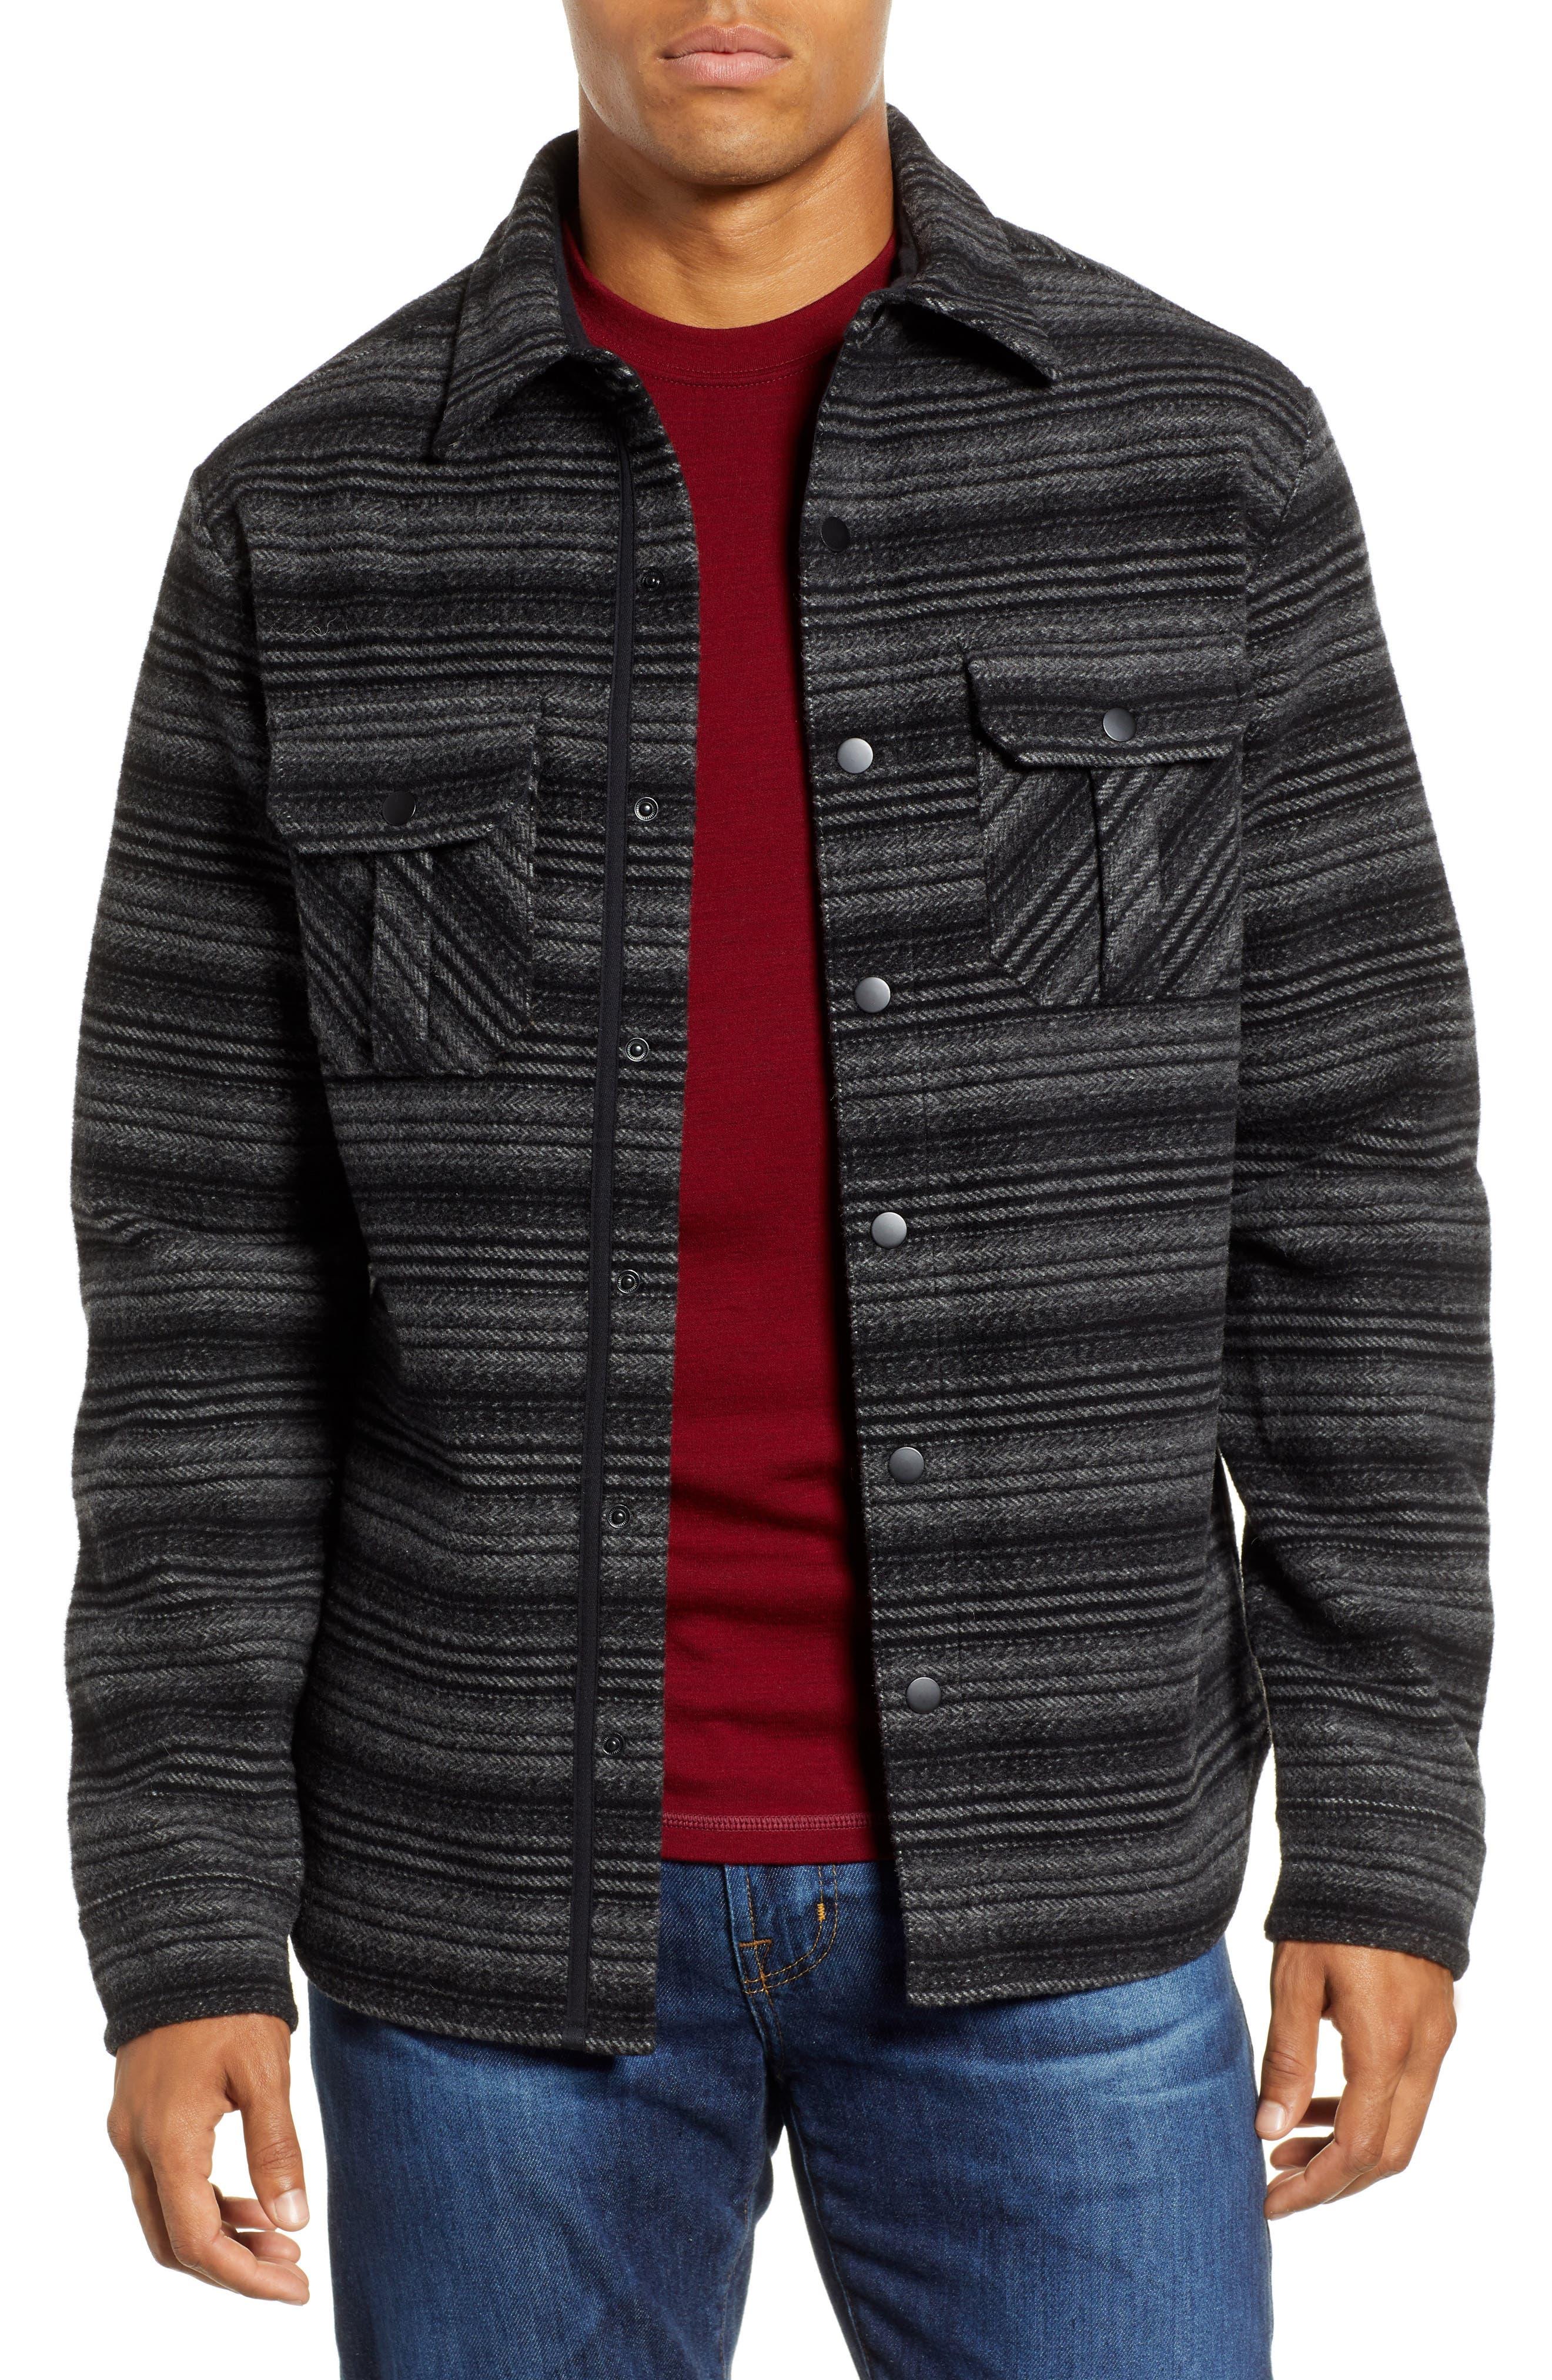 Anchor Line Flannel Shirt Jacket,                         Main,                         color, MEDIUM GREY/ BLACK